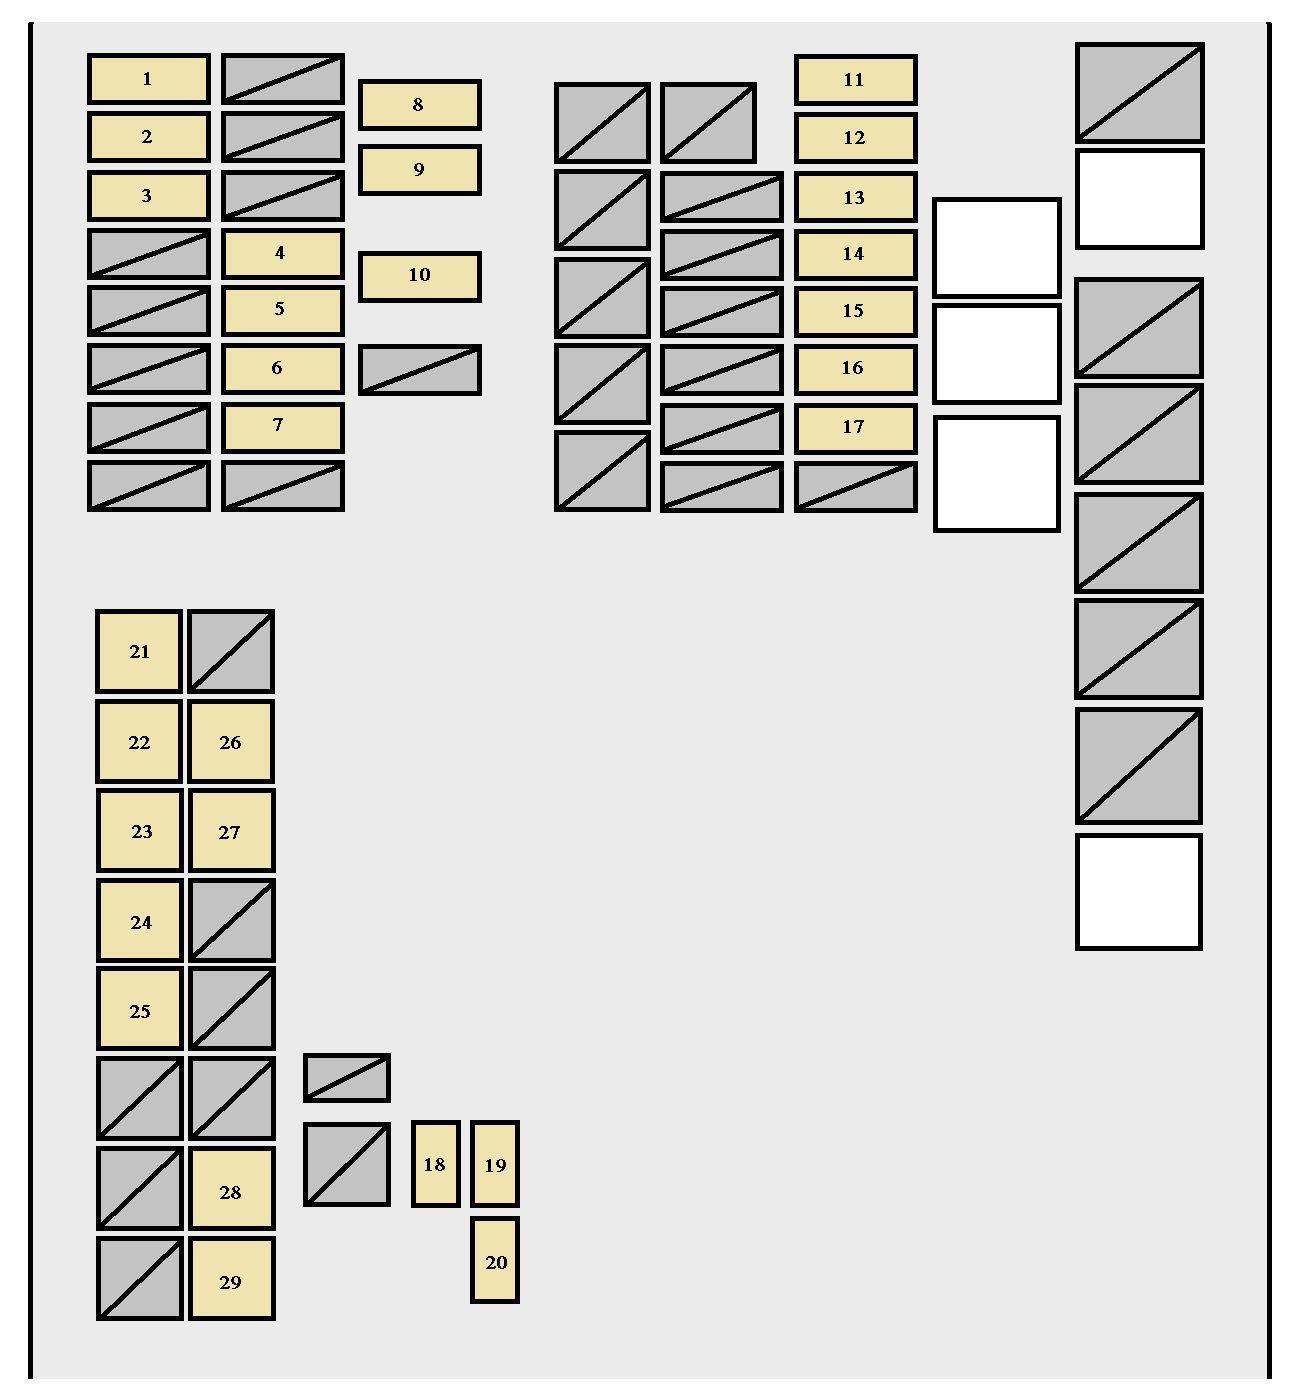 2004 scion xb wiring diagram 1998 dodge ram 2500 tail light fuse box trusted diagrams